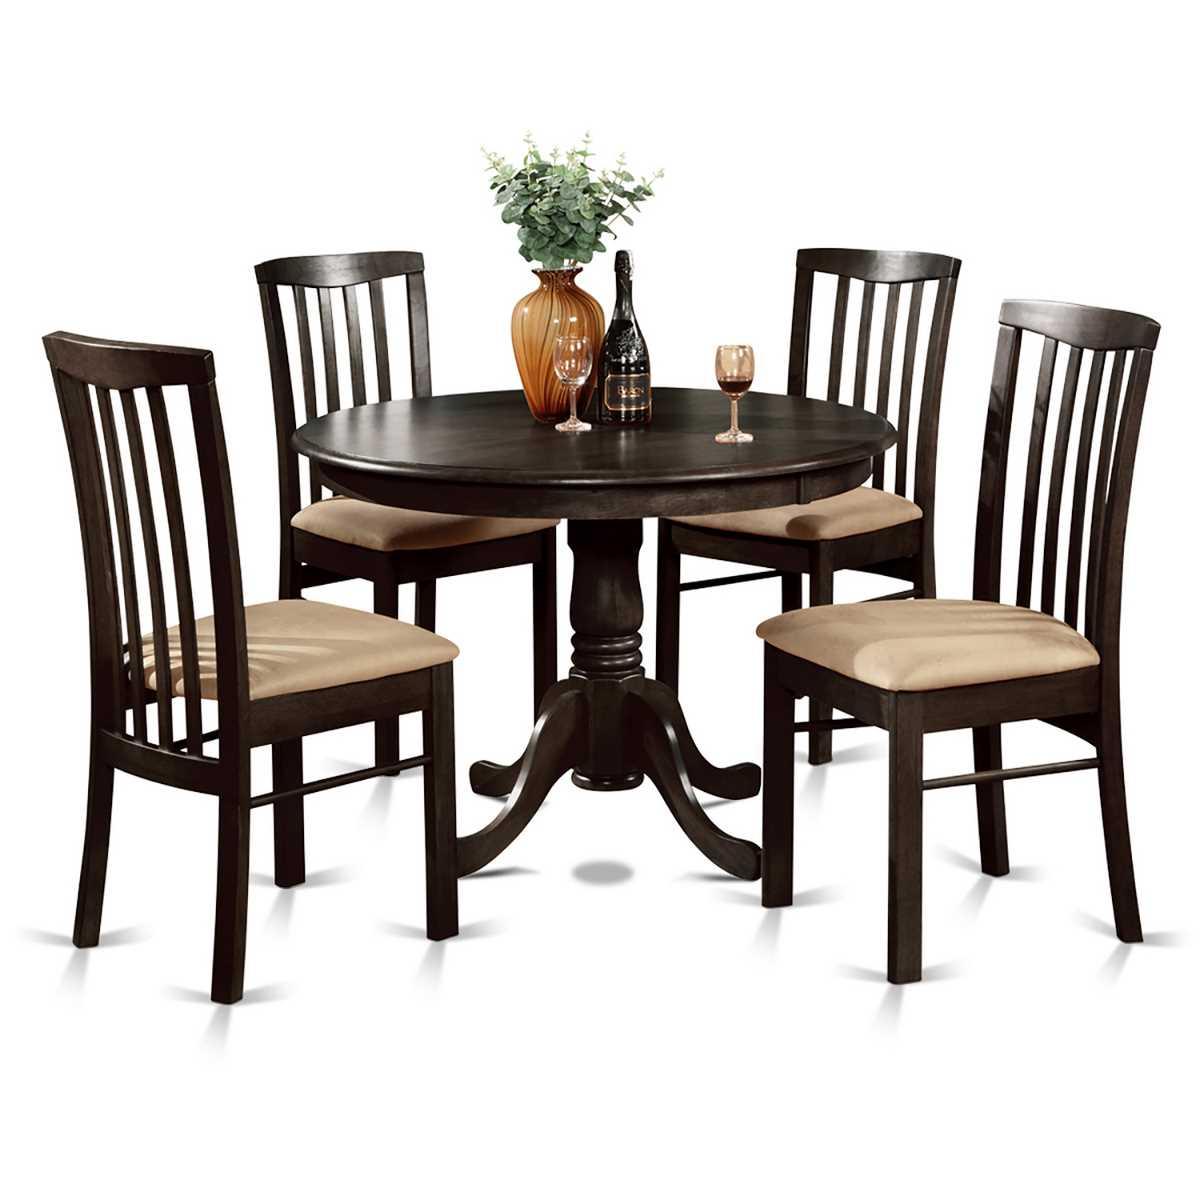 Set of 4 kitchen chairs Photo - 11